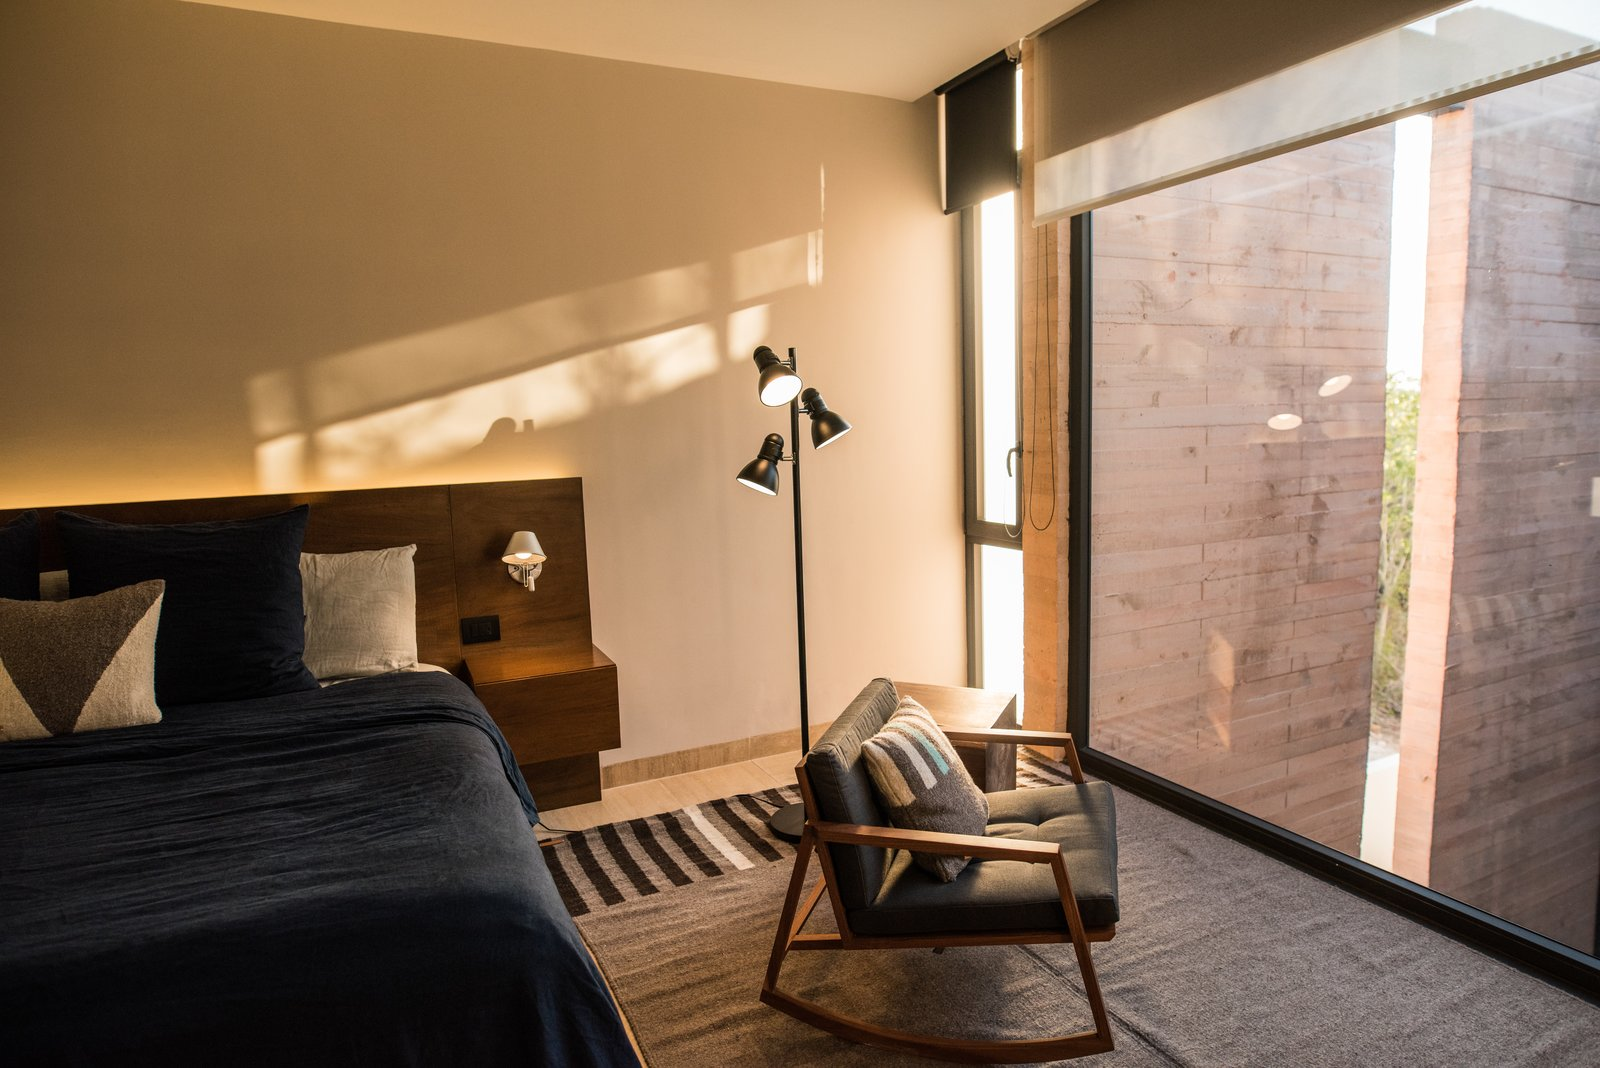 Bedroom, Chair, Travertine Floor, Accent Lighting, Marble Floor, and Floor Lighting Bedroom  Casa Chaaltun by tescala